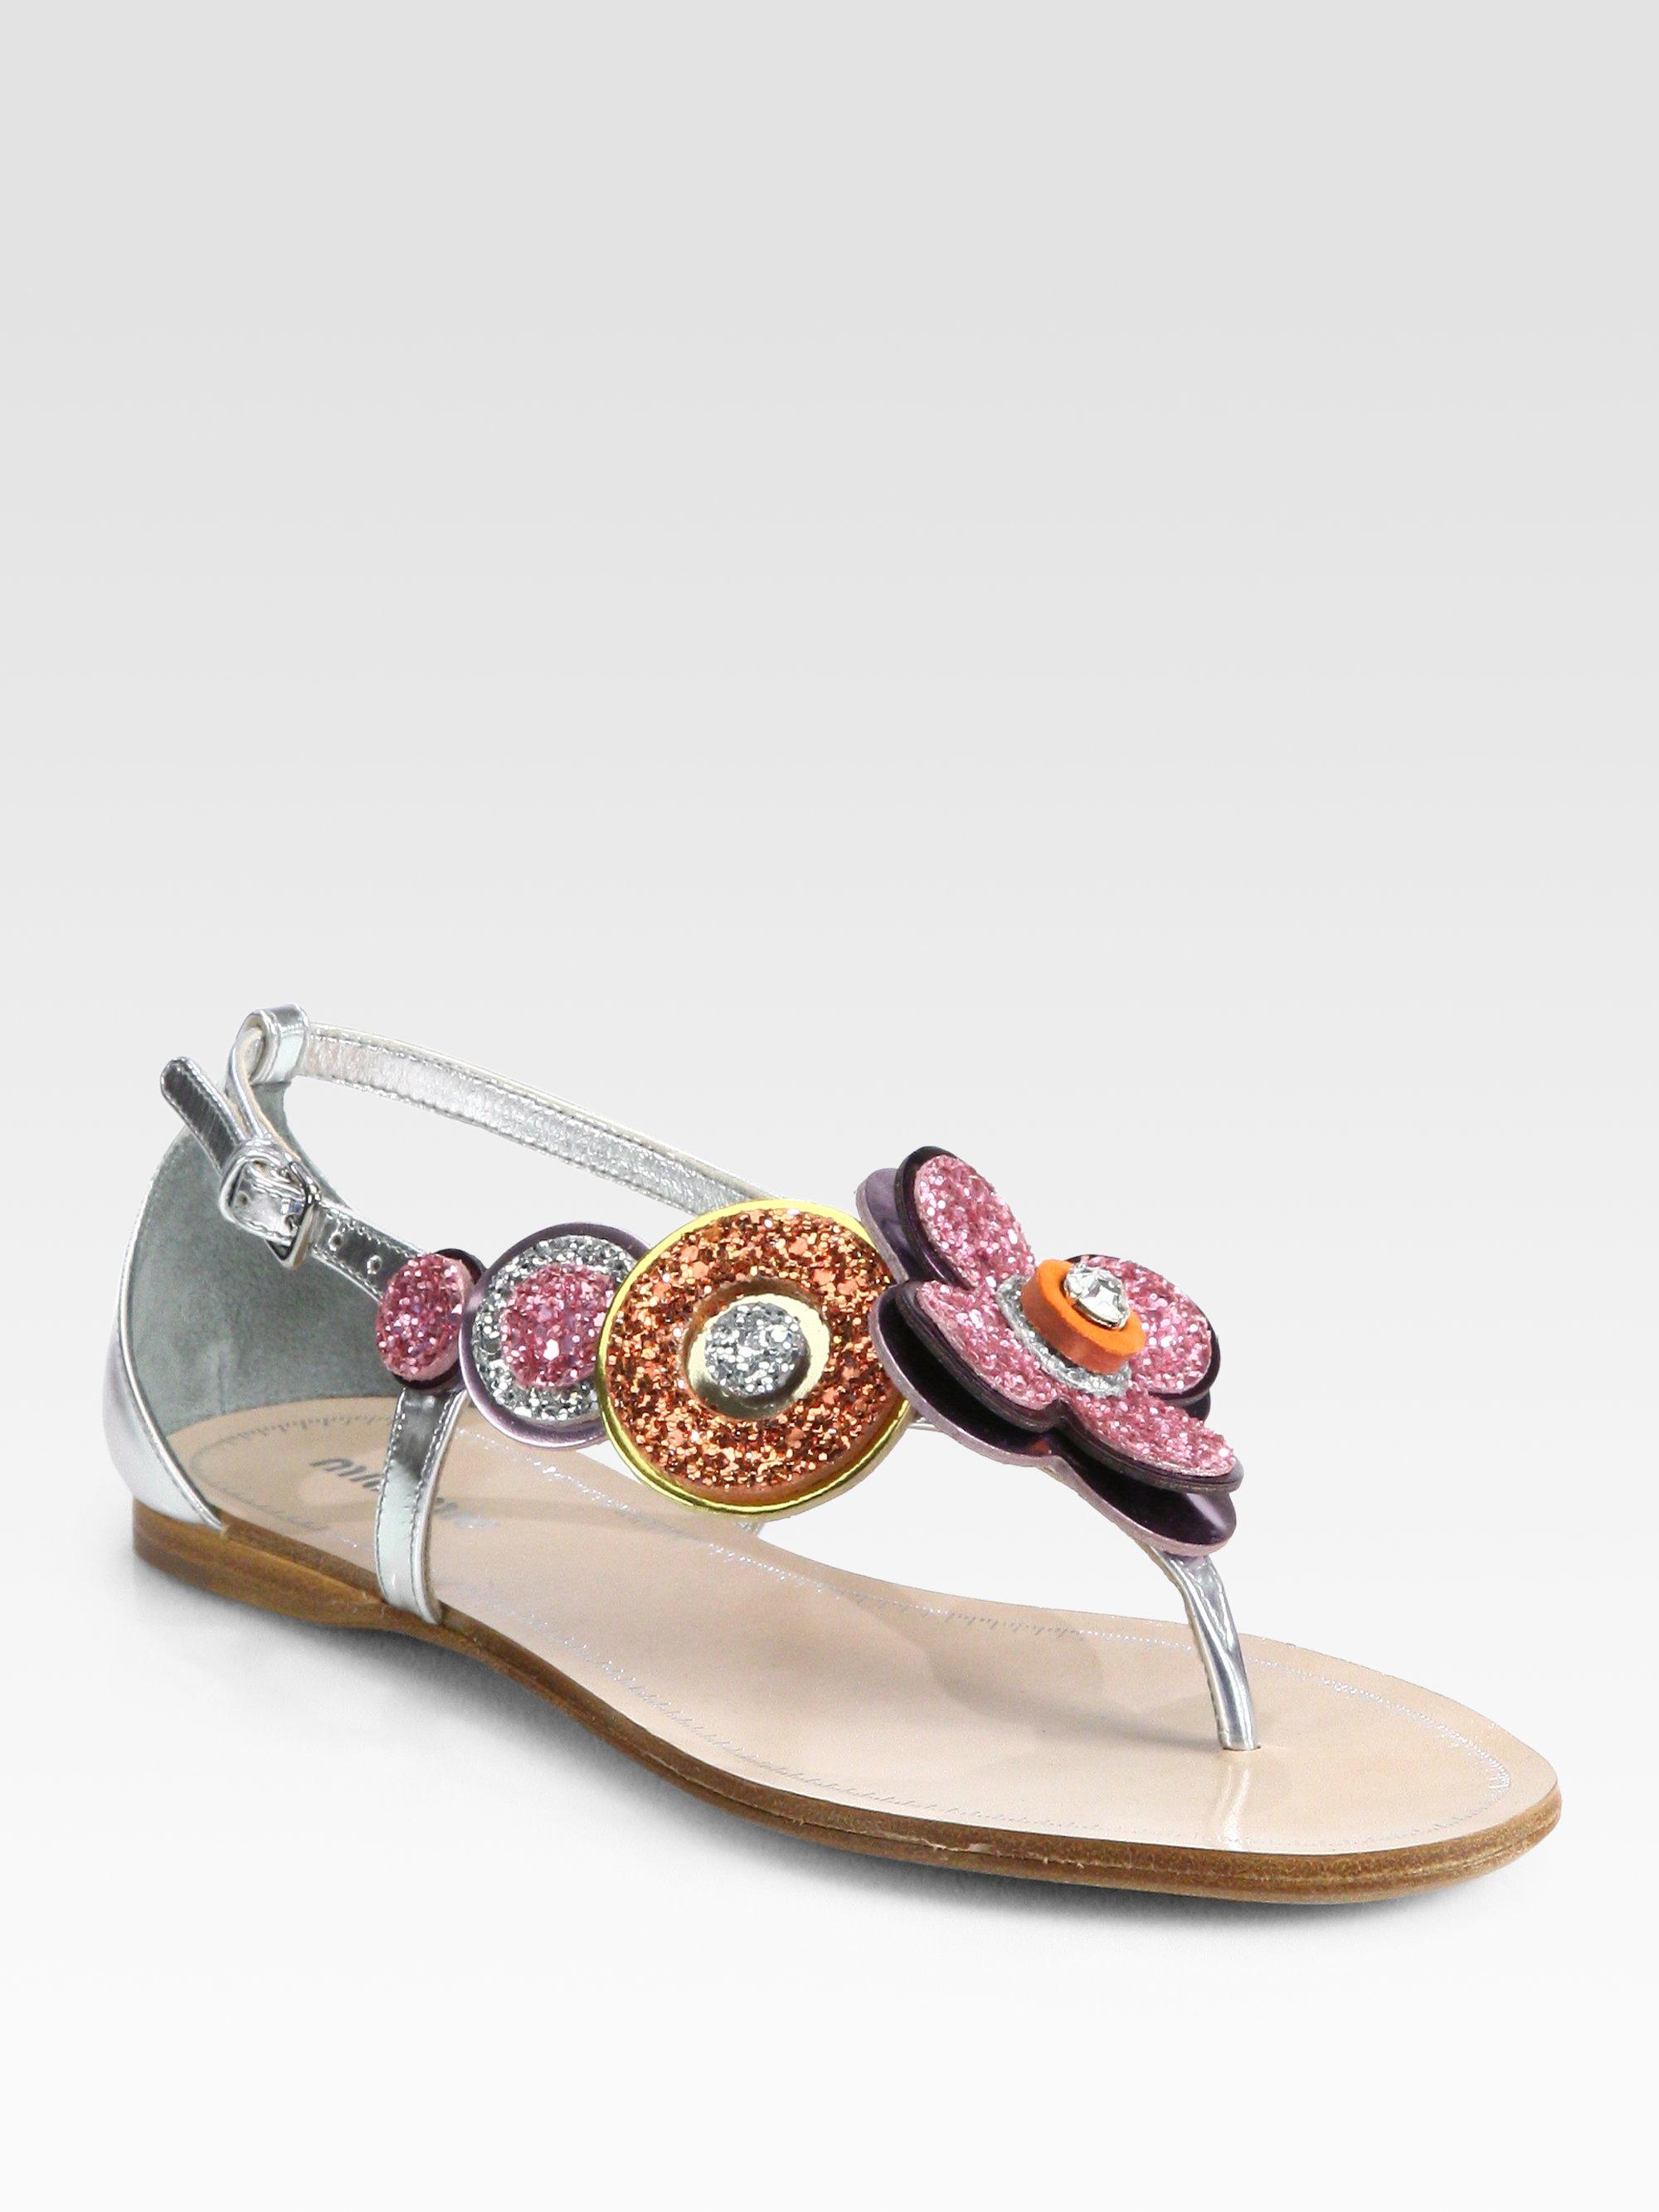 Miu Miu Glitter Jeweled Flower Metallic Leather Sandals In